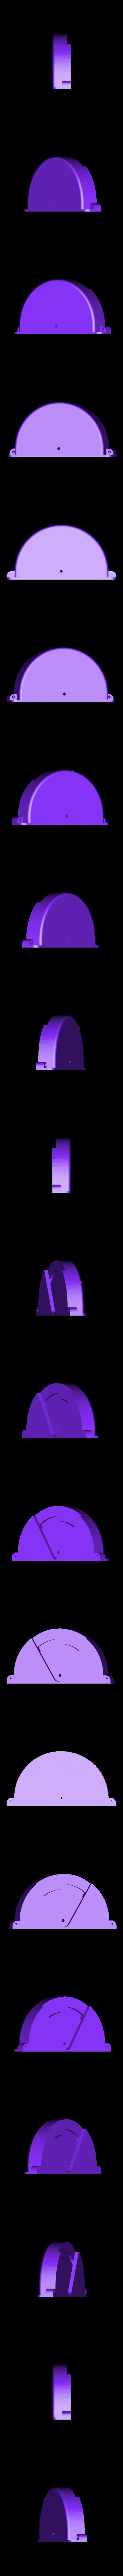 Manete 737 - Base_R-1.STL Download STL file Adapting Boeing to Logitech Extrem 3D Pro 3D print model • 3D printing template, Eduardohbm